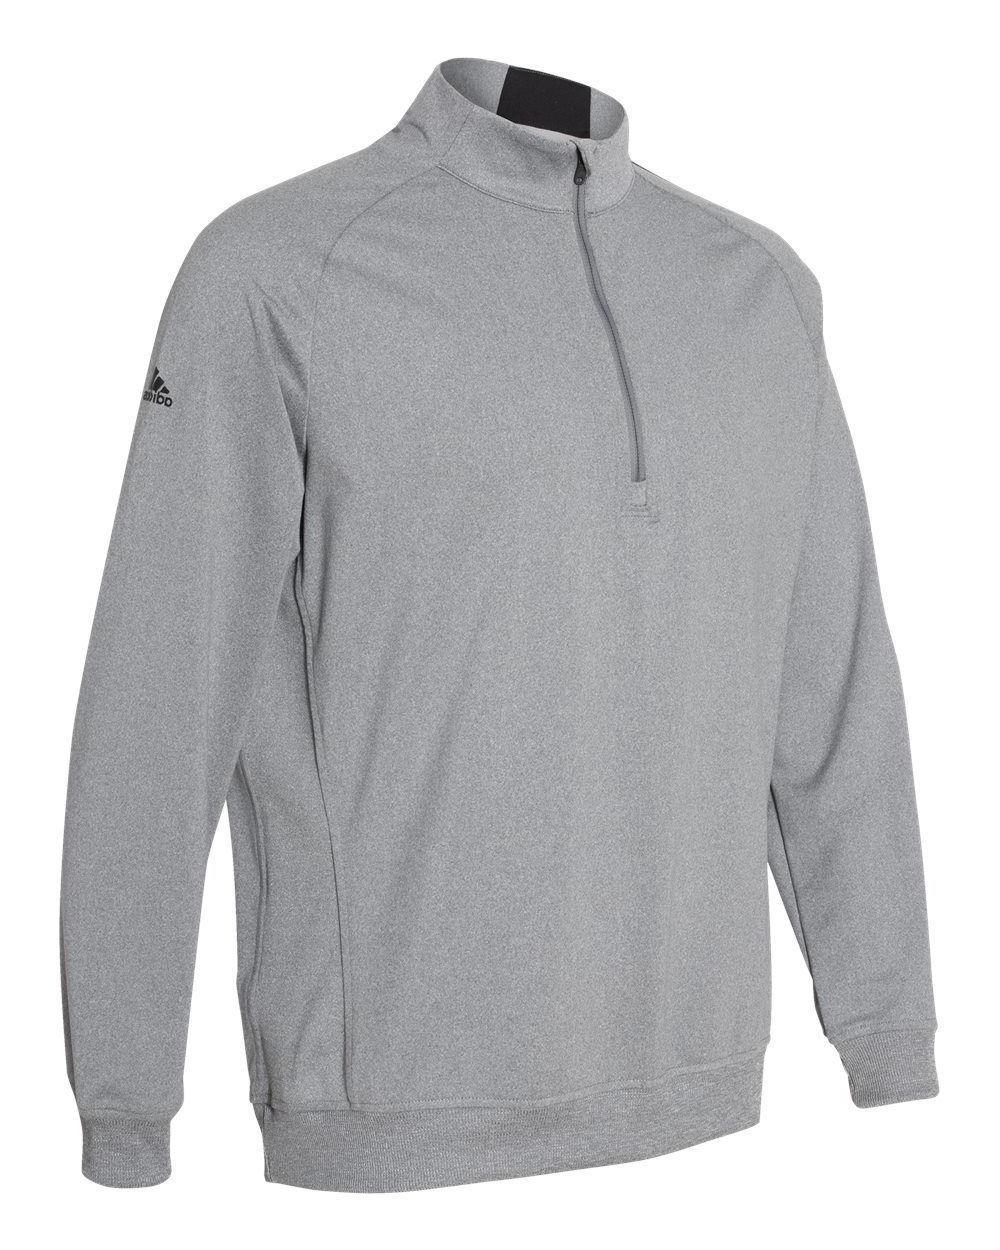 Adidas - Men's Golf Sizes A270,